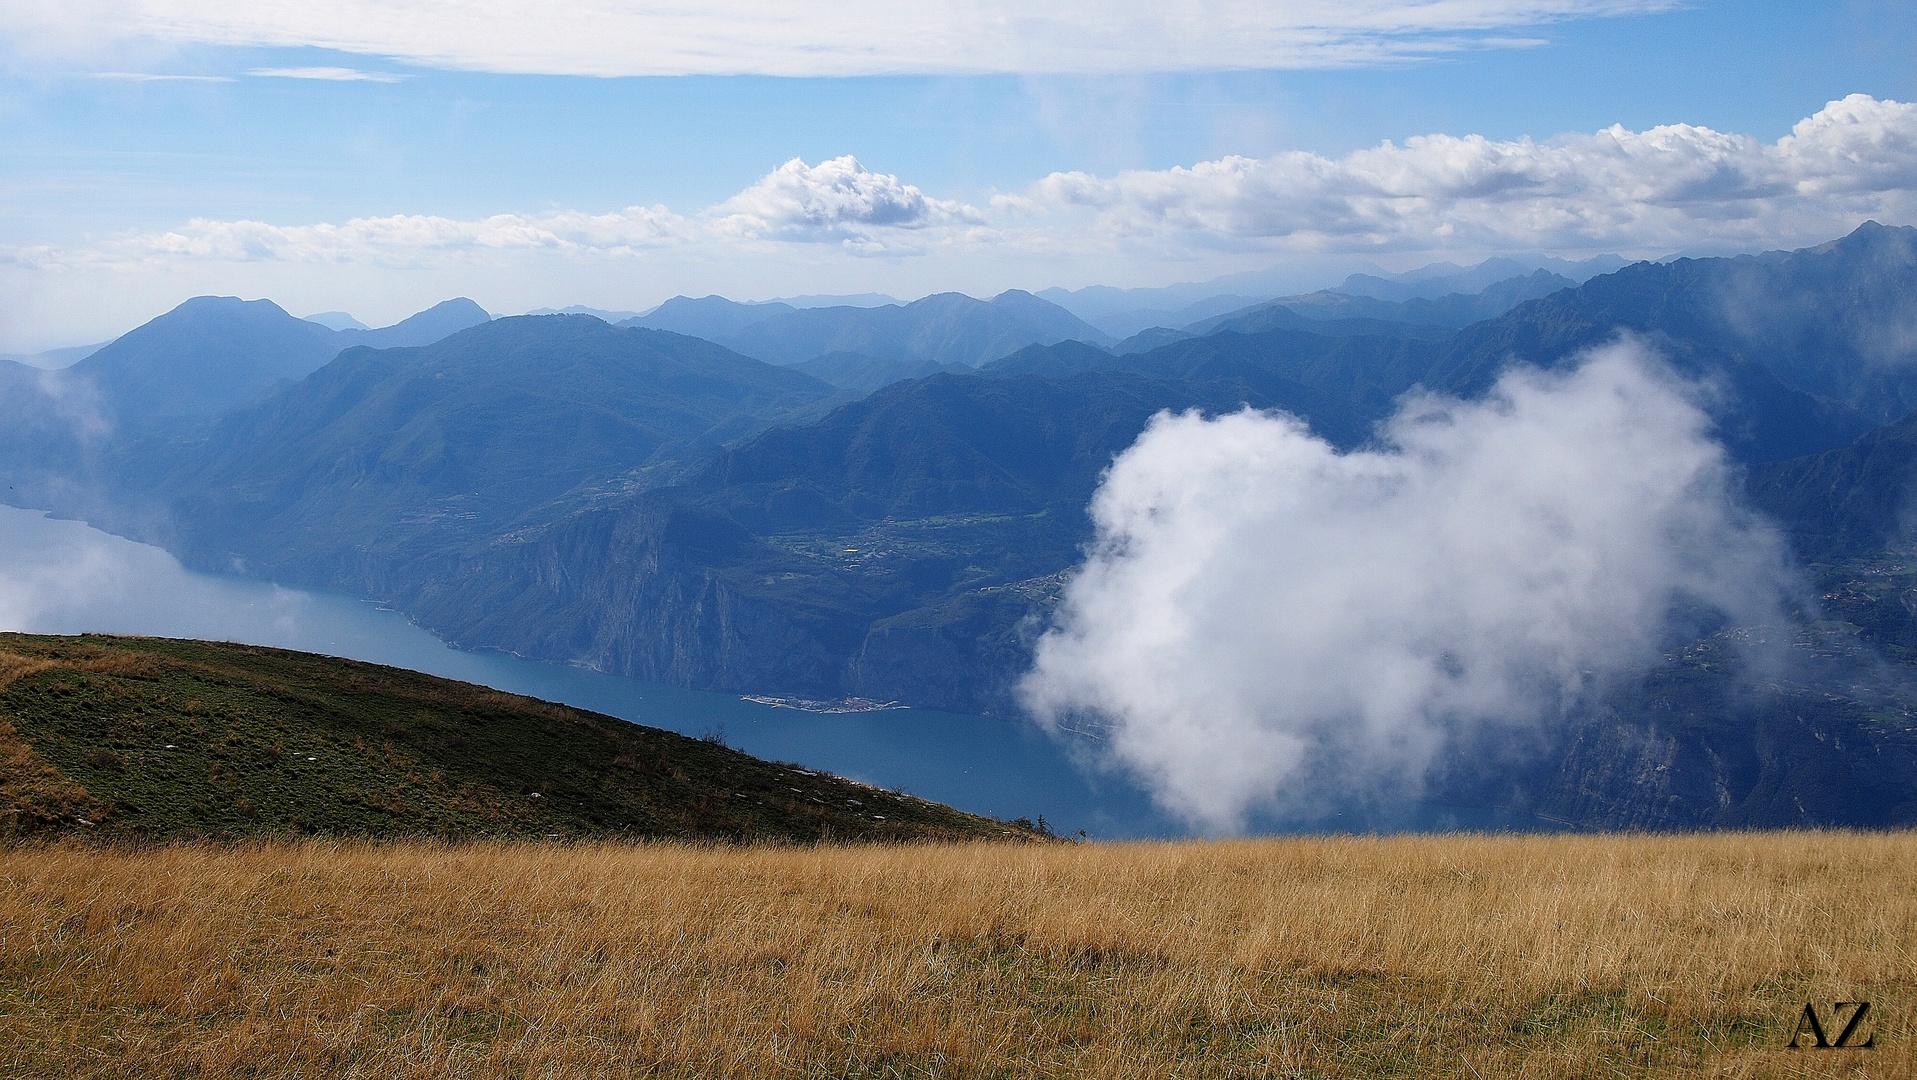 Wattebausch am Monte Baldo